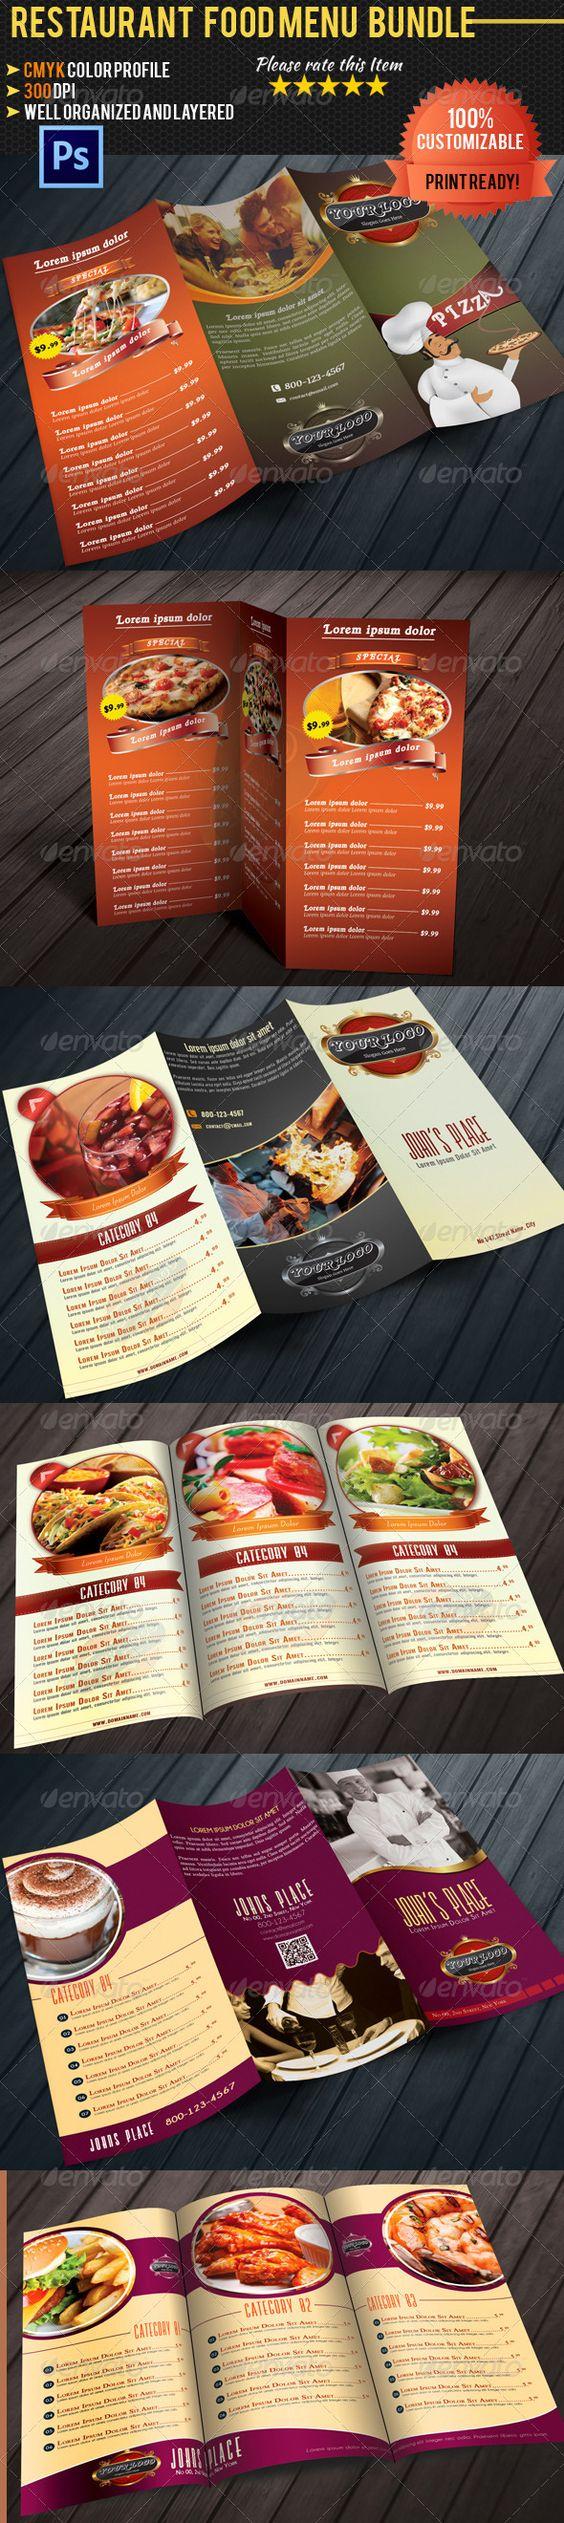 Trifold Restaurant Food Menu Template Bundle – A La Carte Menu Template